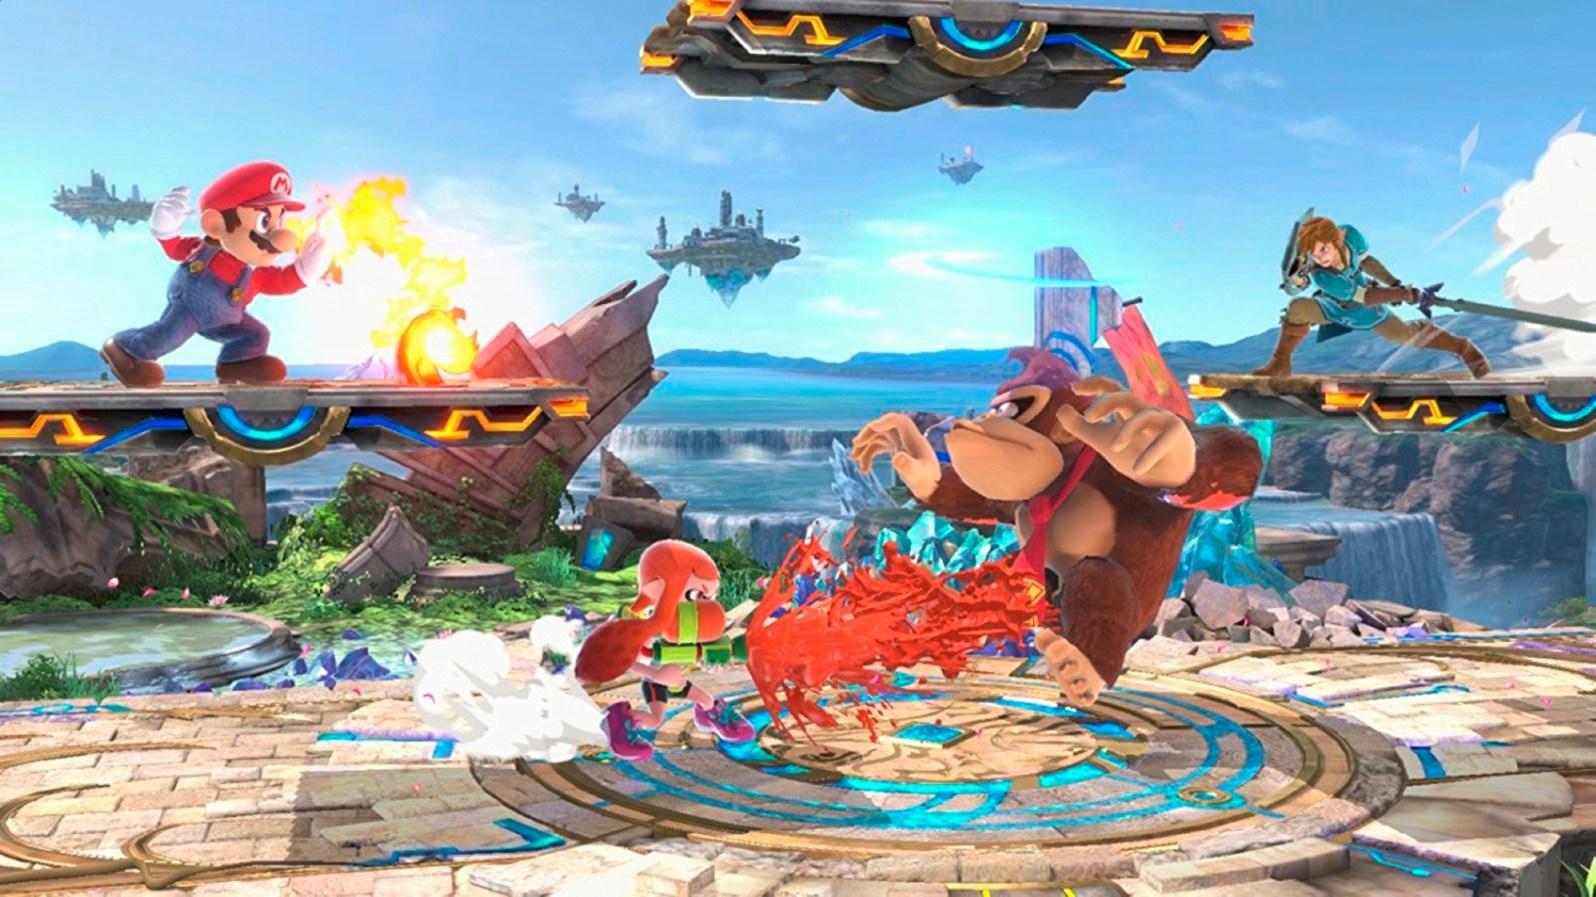 Quelle: Amazon/Nintendo - Super Smash Bros. Ultimate